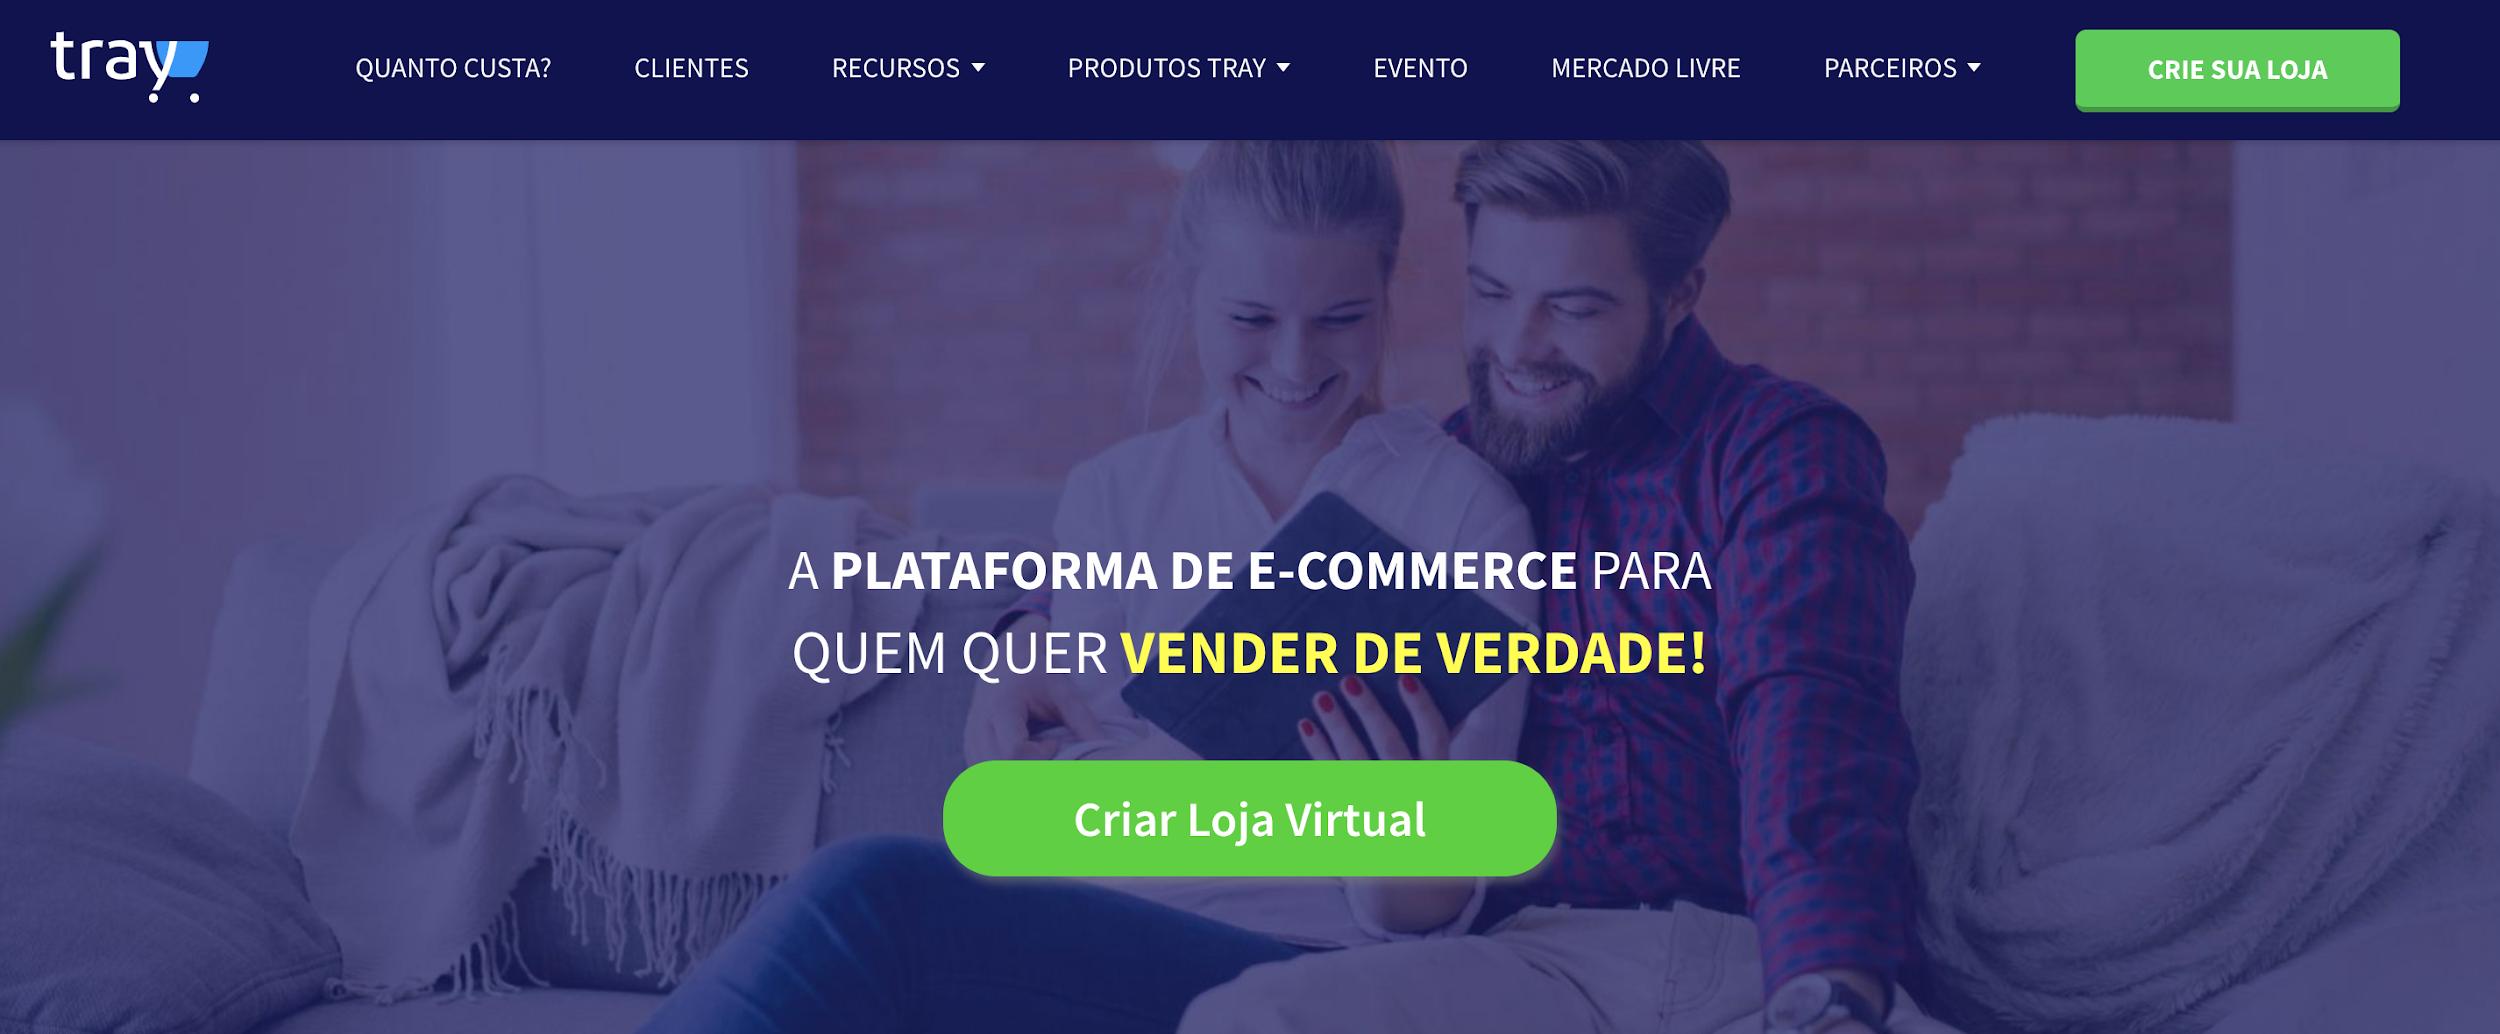 Tray como exemplo de plataforma de ecommerce